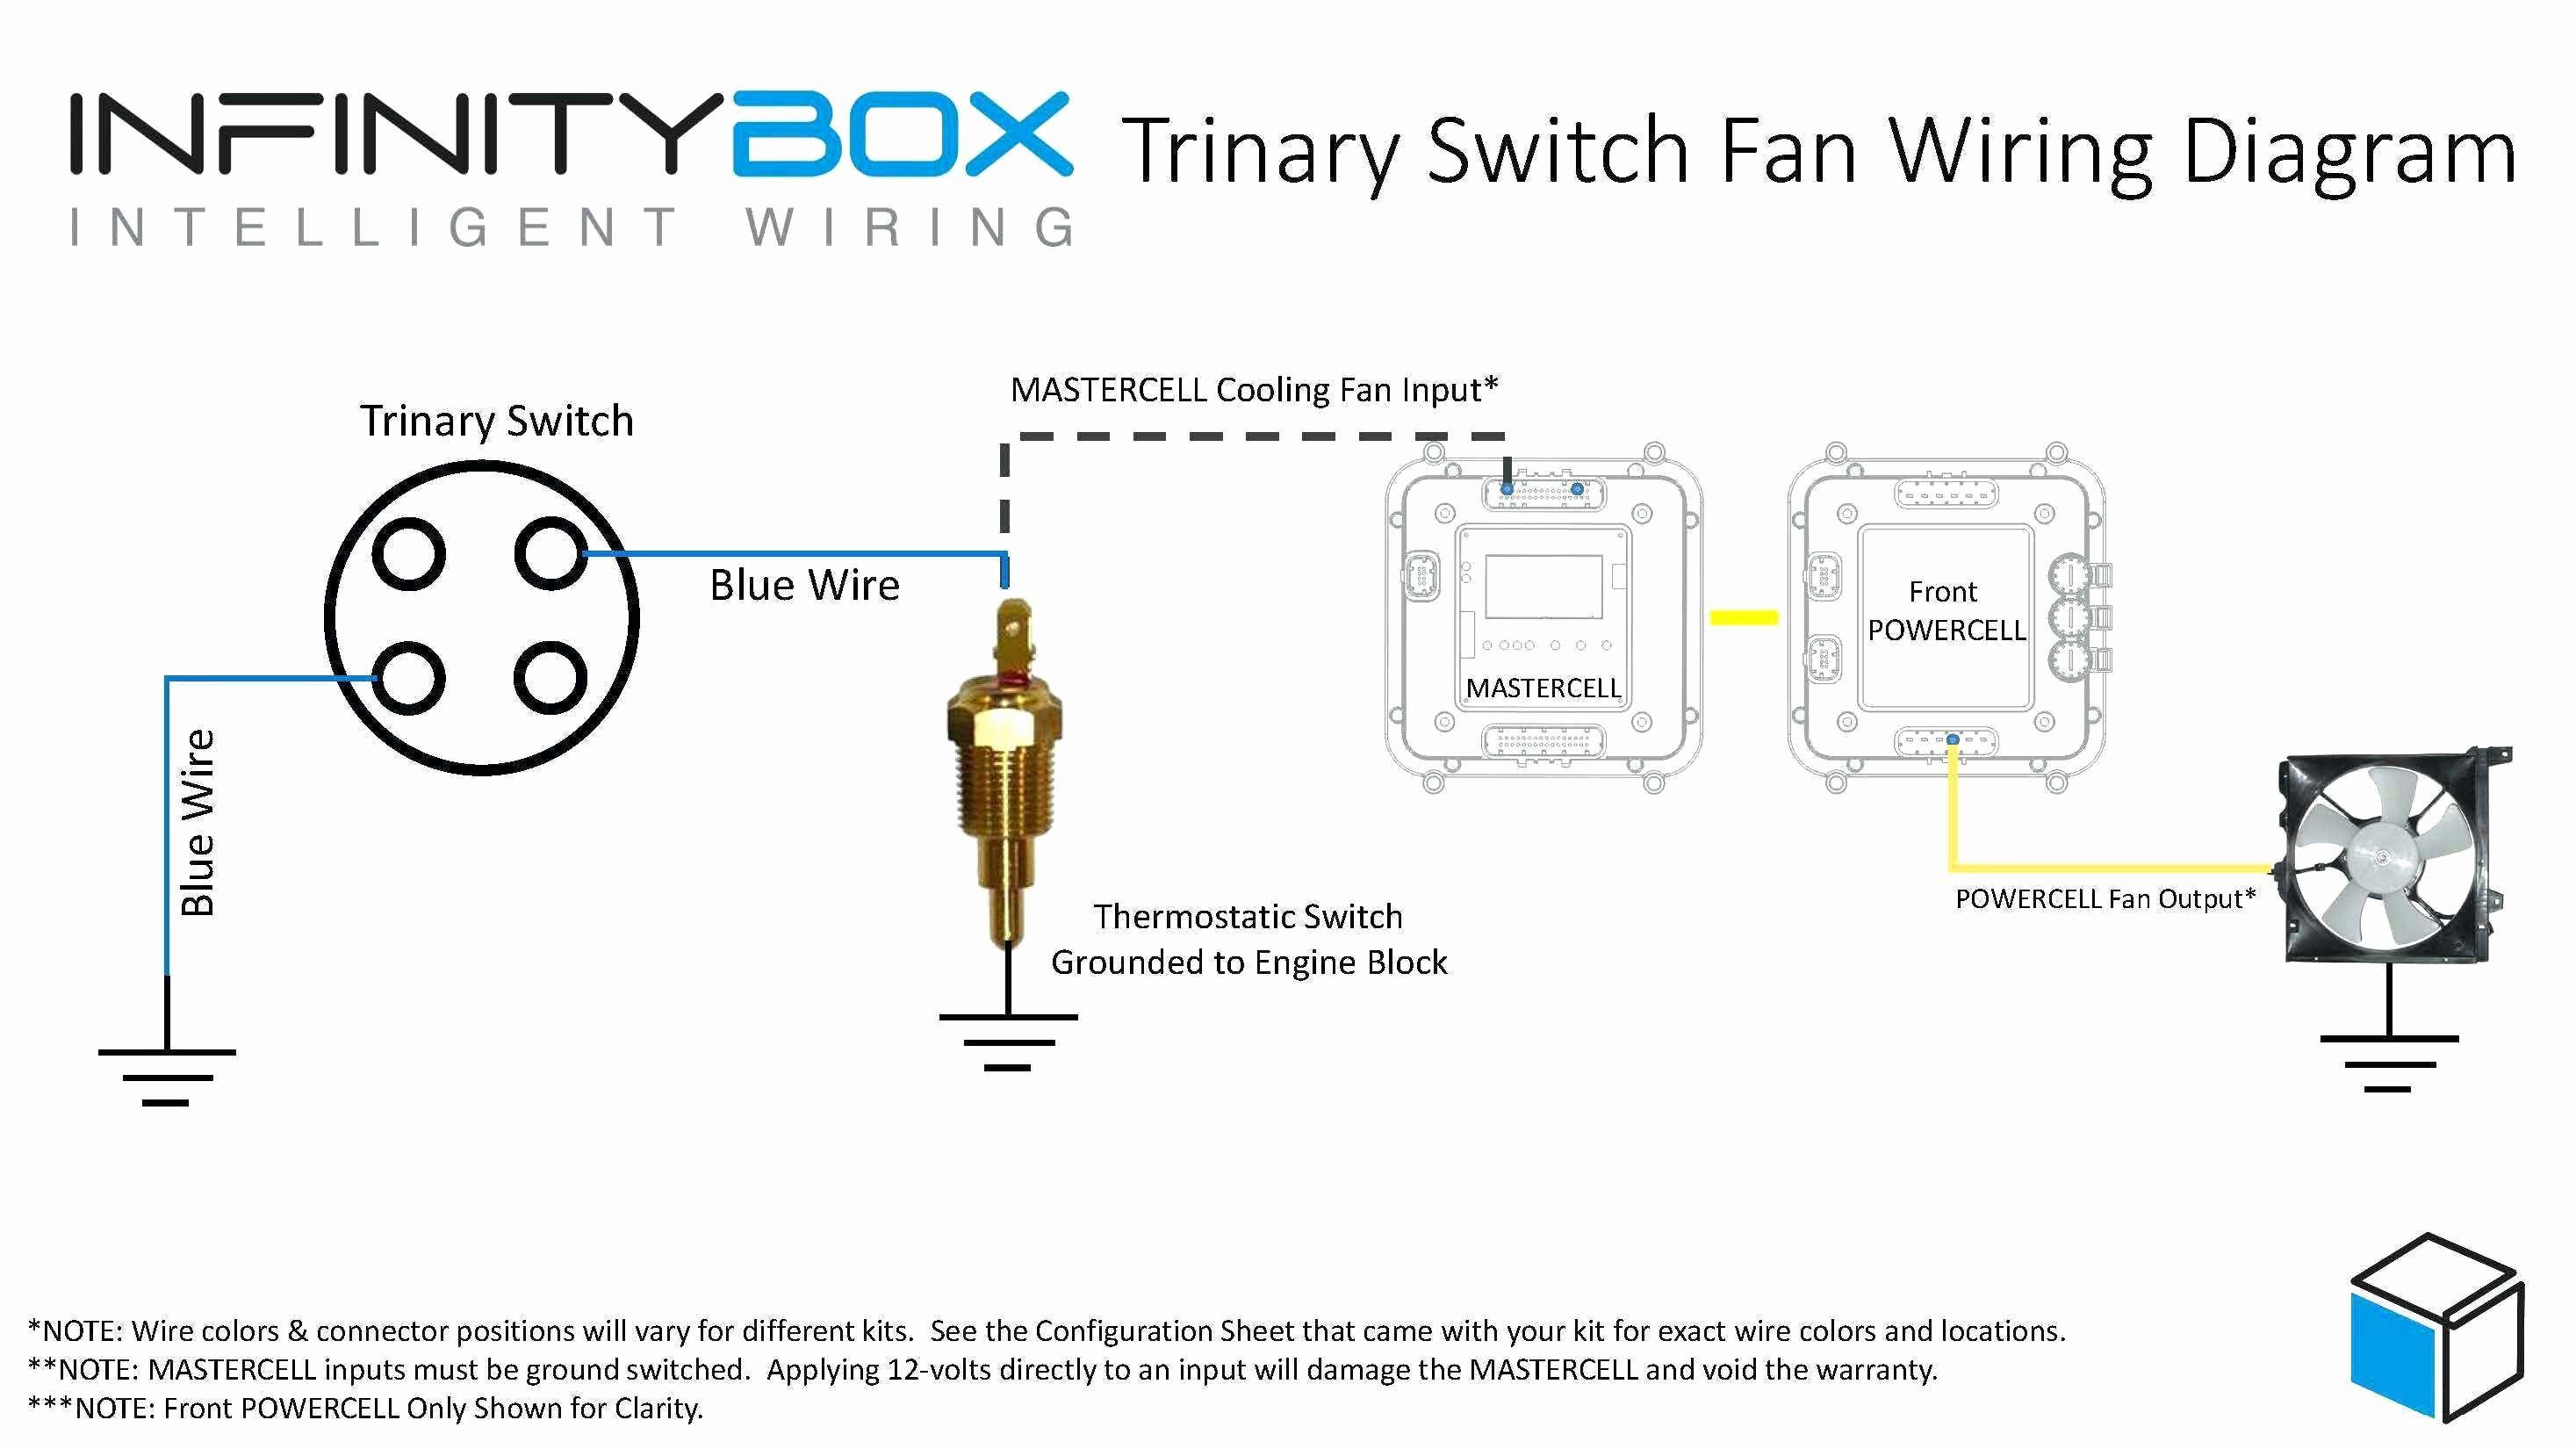 30 Amp Outlet Wiring Diagram Elegant 20 Amp Twist Lock Plug Wiring - L14 30 Wiring Diagram